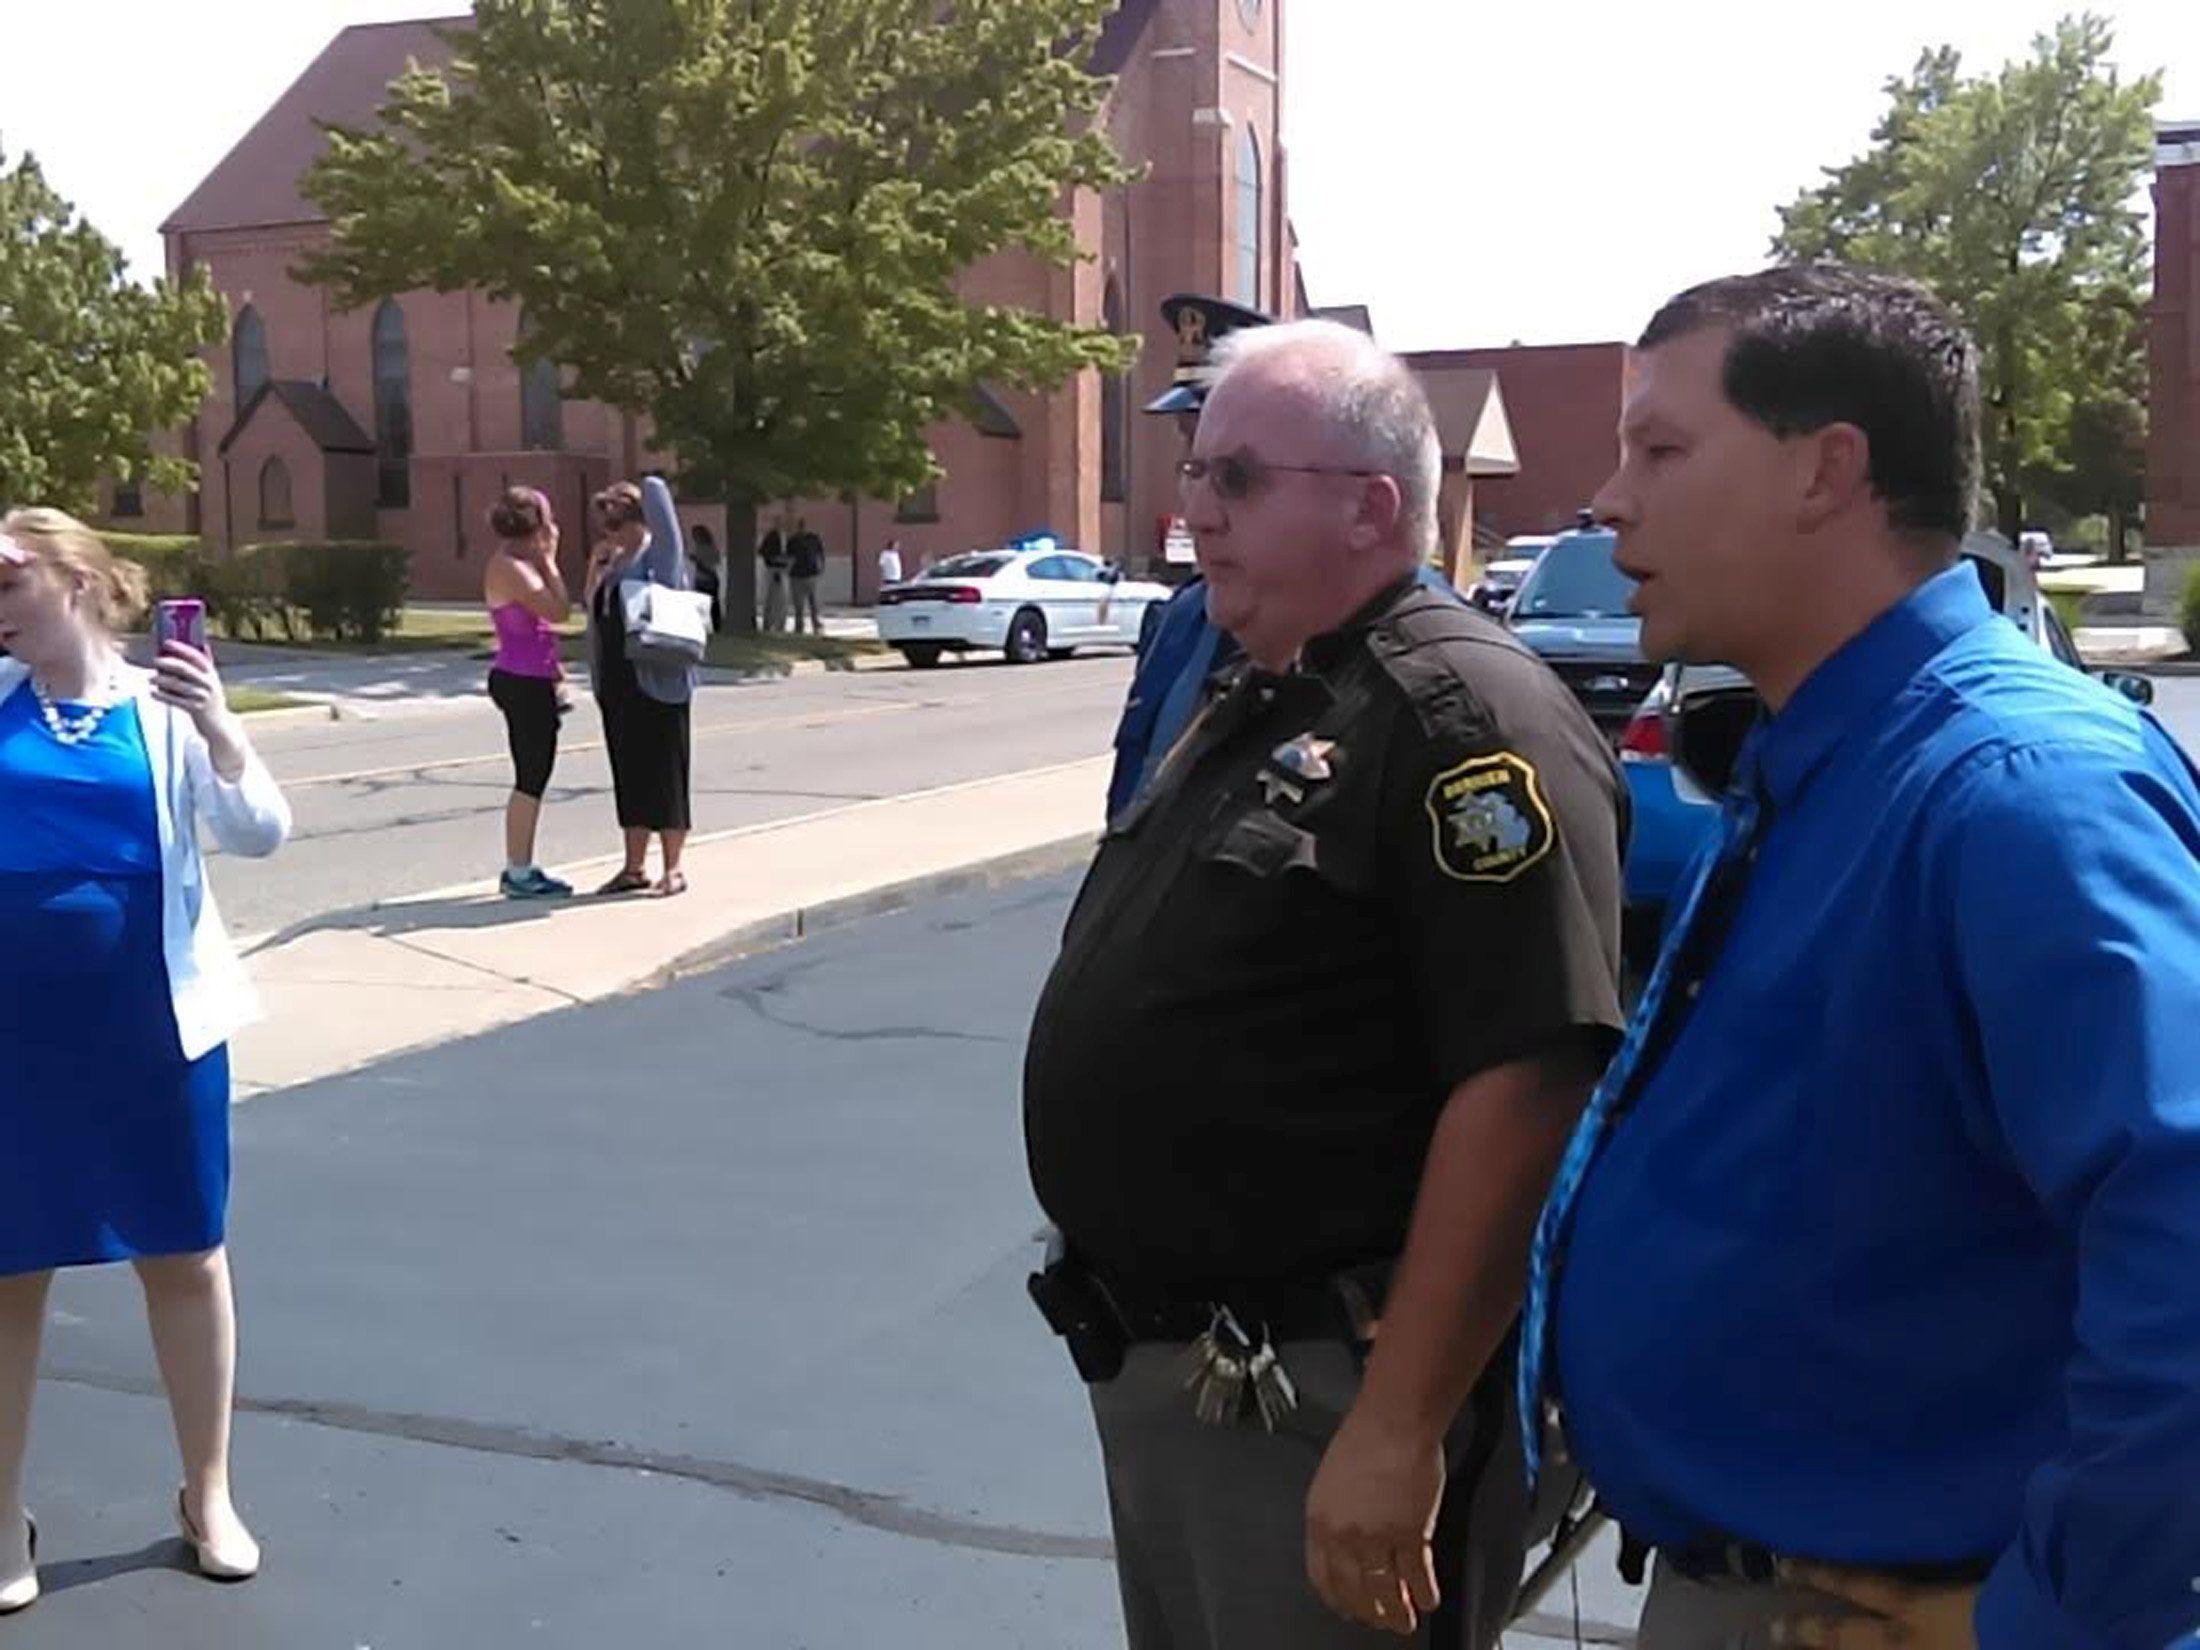 2016-07-11T224647Z_1293001033_S1AETPATSHAA_RTRMADP_3_USA-POLICE-MICHIGAN-GUNMAN